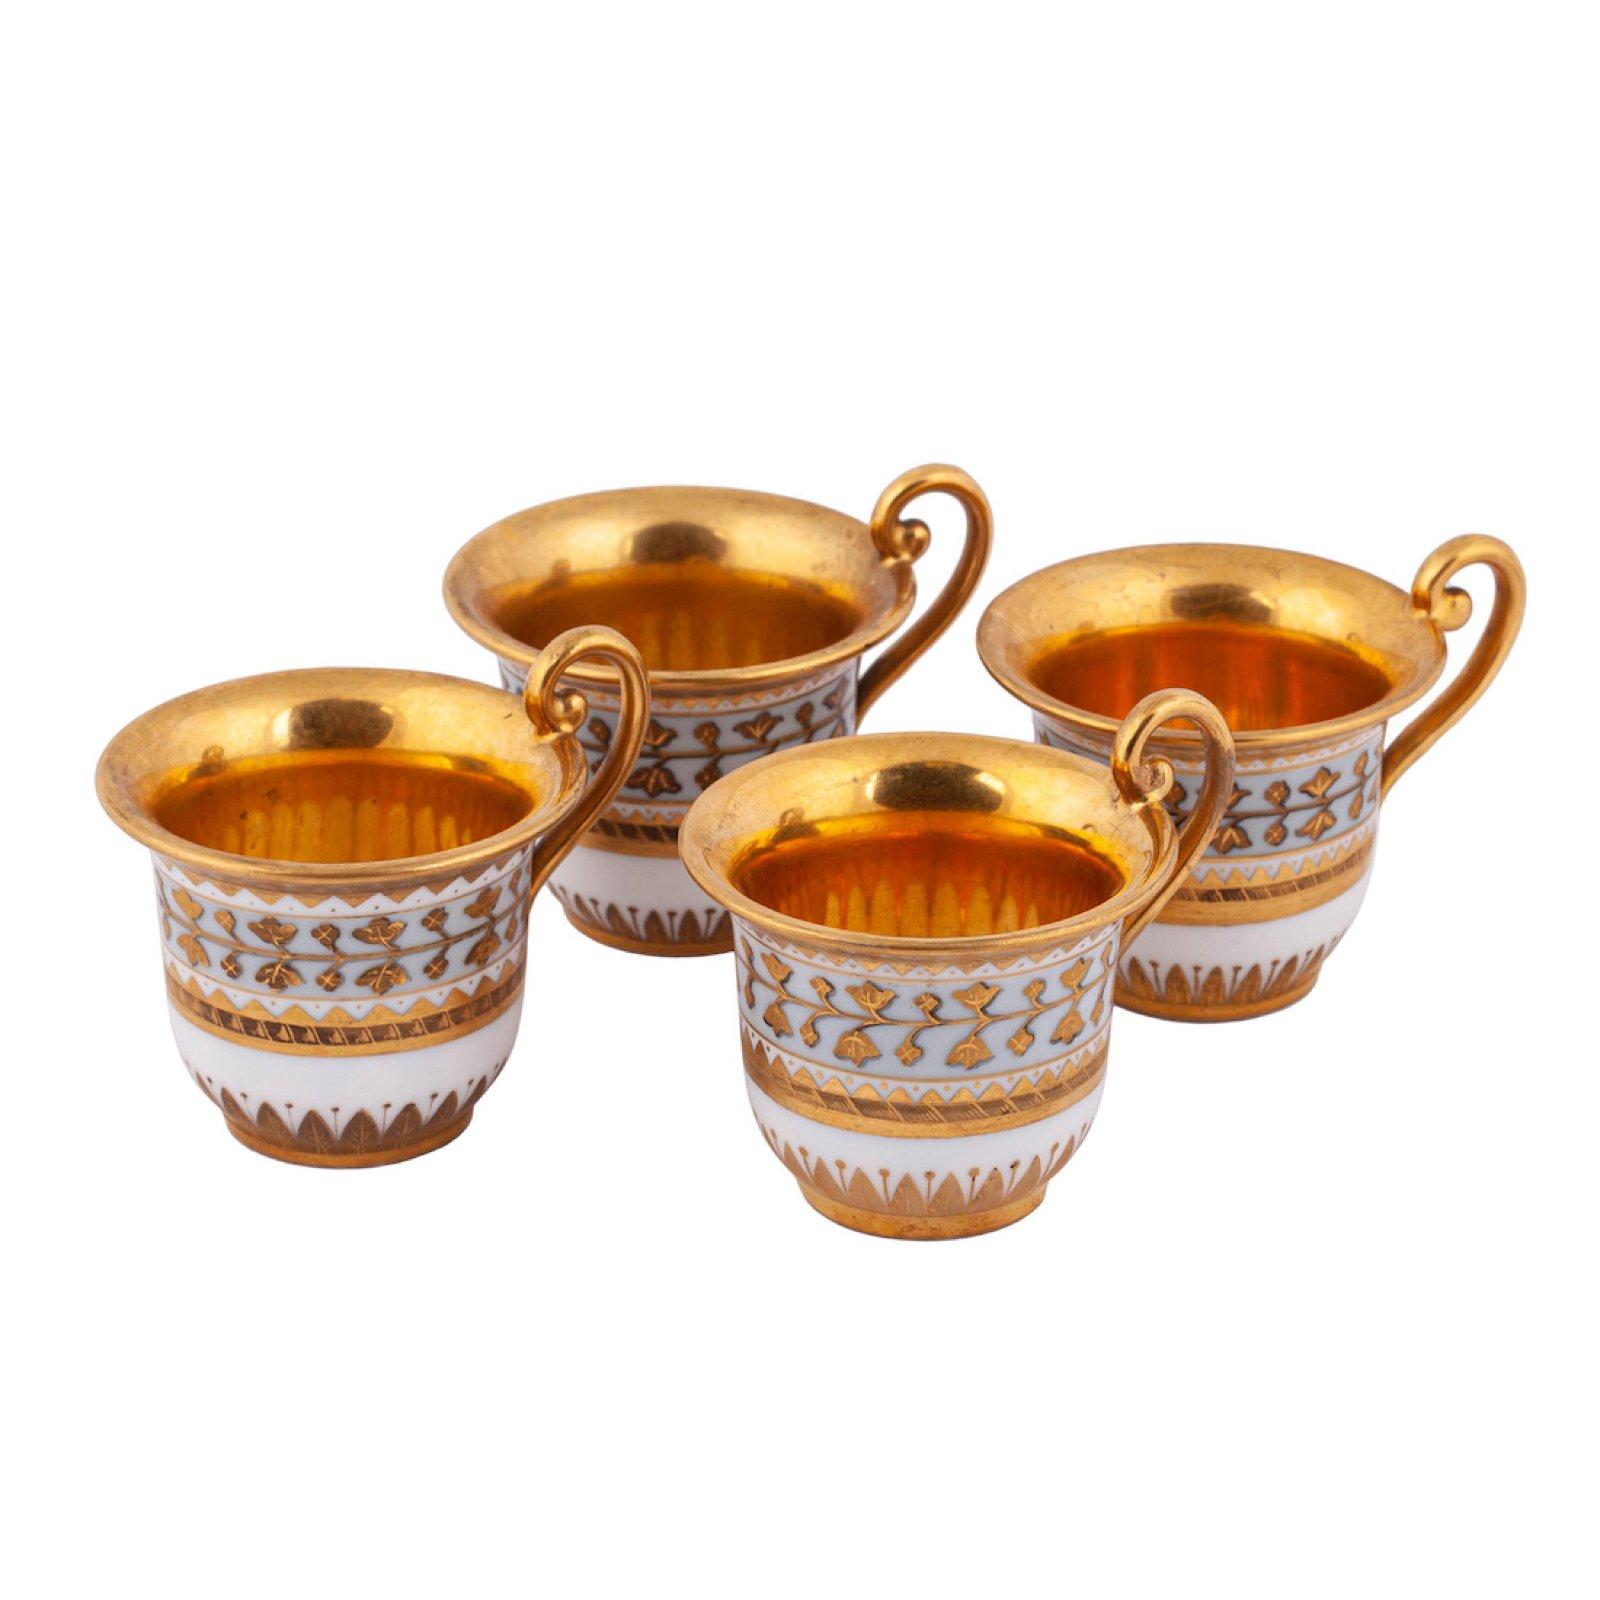 A set of 4 Russian porcelain cups